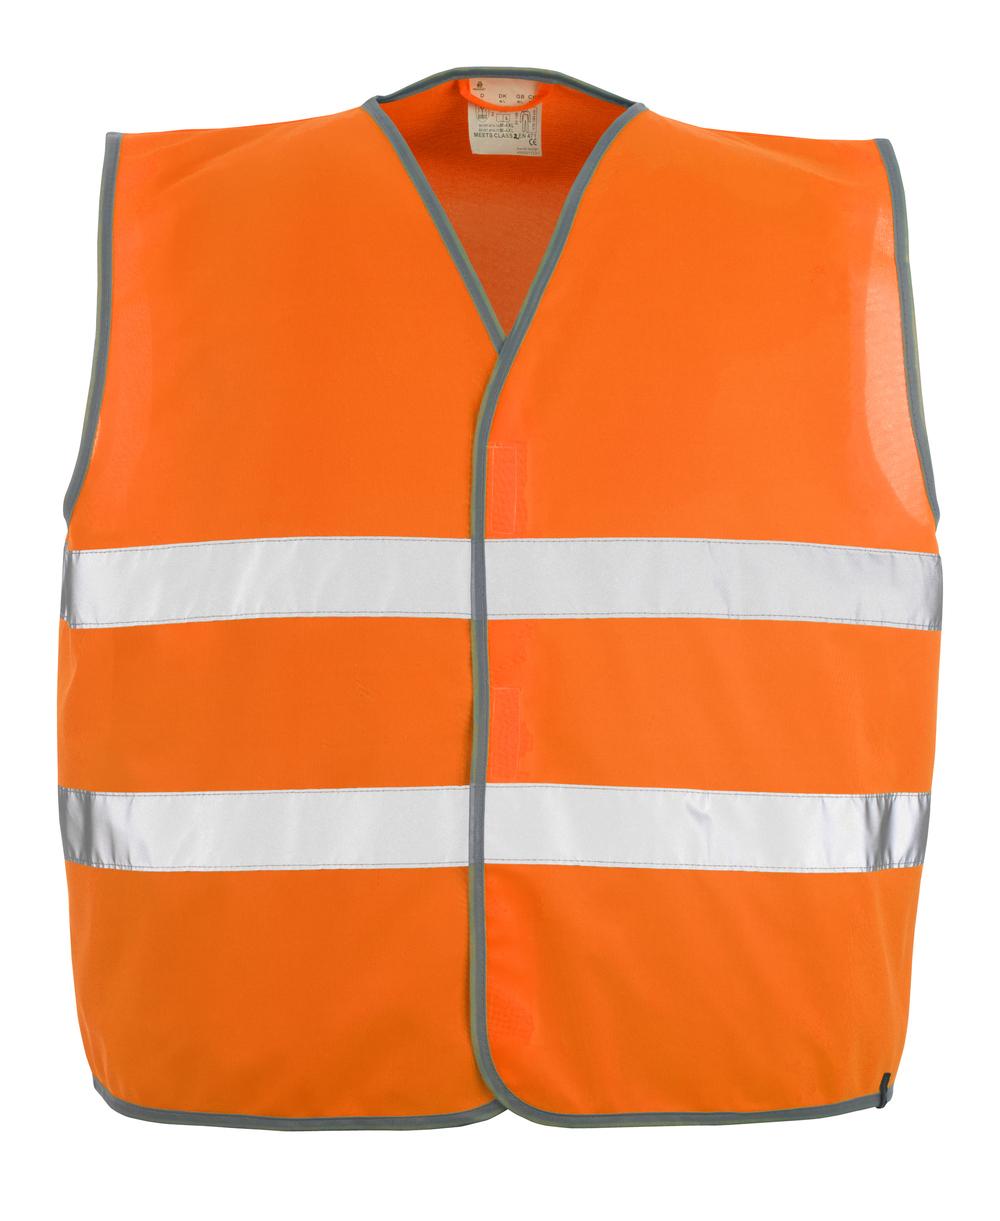 50187-874-14 Chaleco de tráfico - naranja de alta vis.